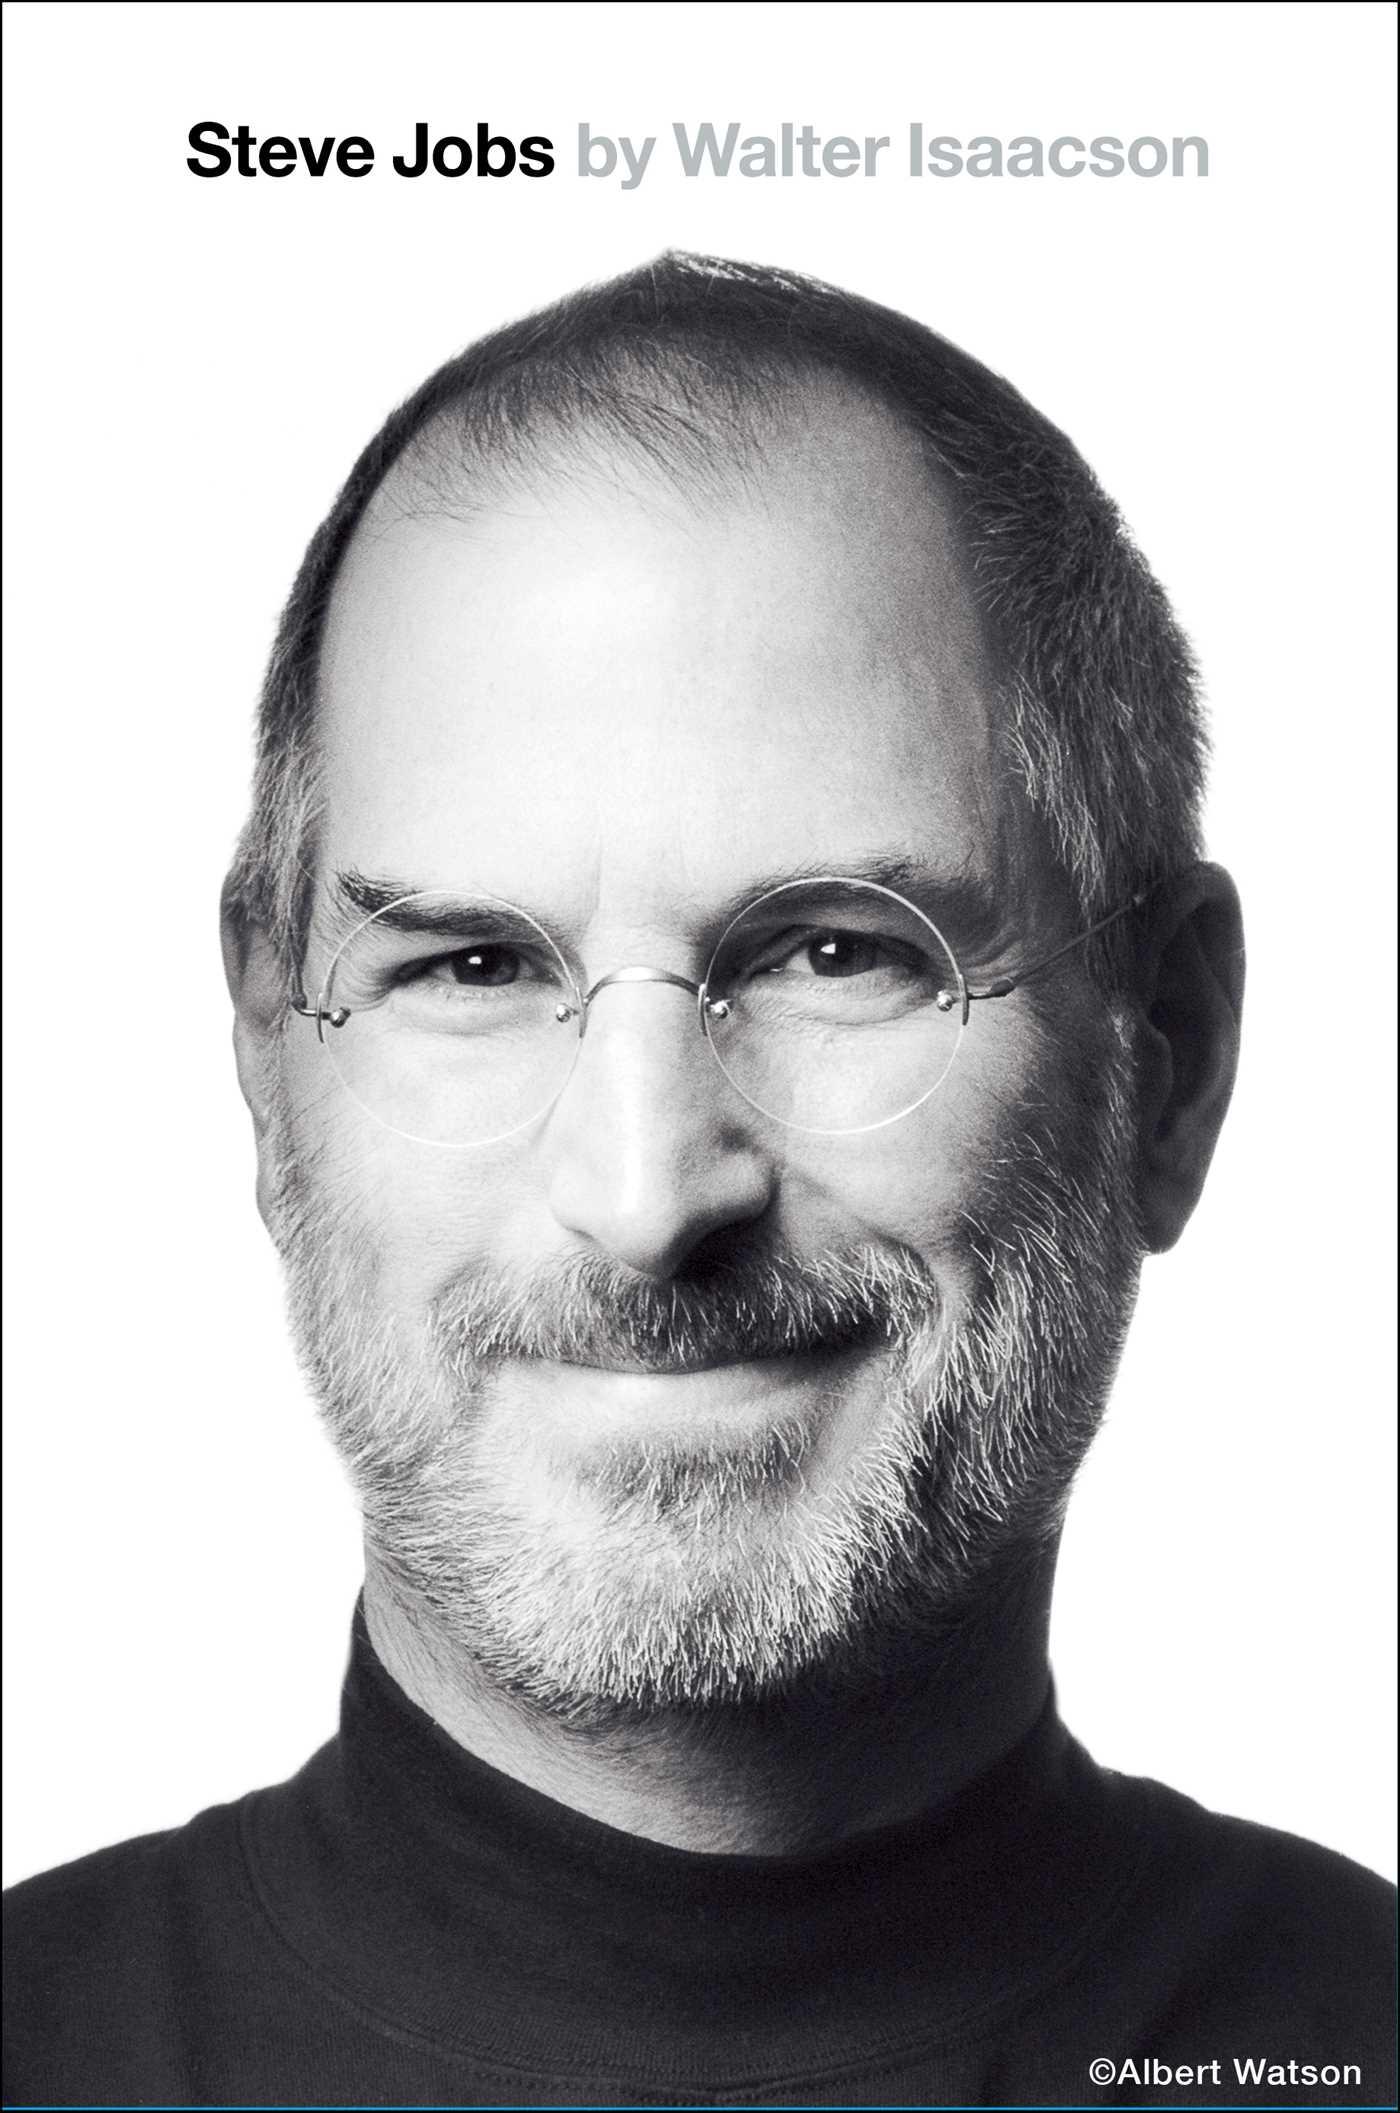 Hd Quality Wallpaper - Steve Jobs By Walter Isaacson - HD Wallpaper